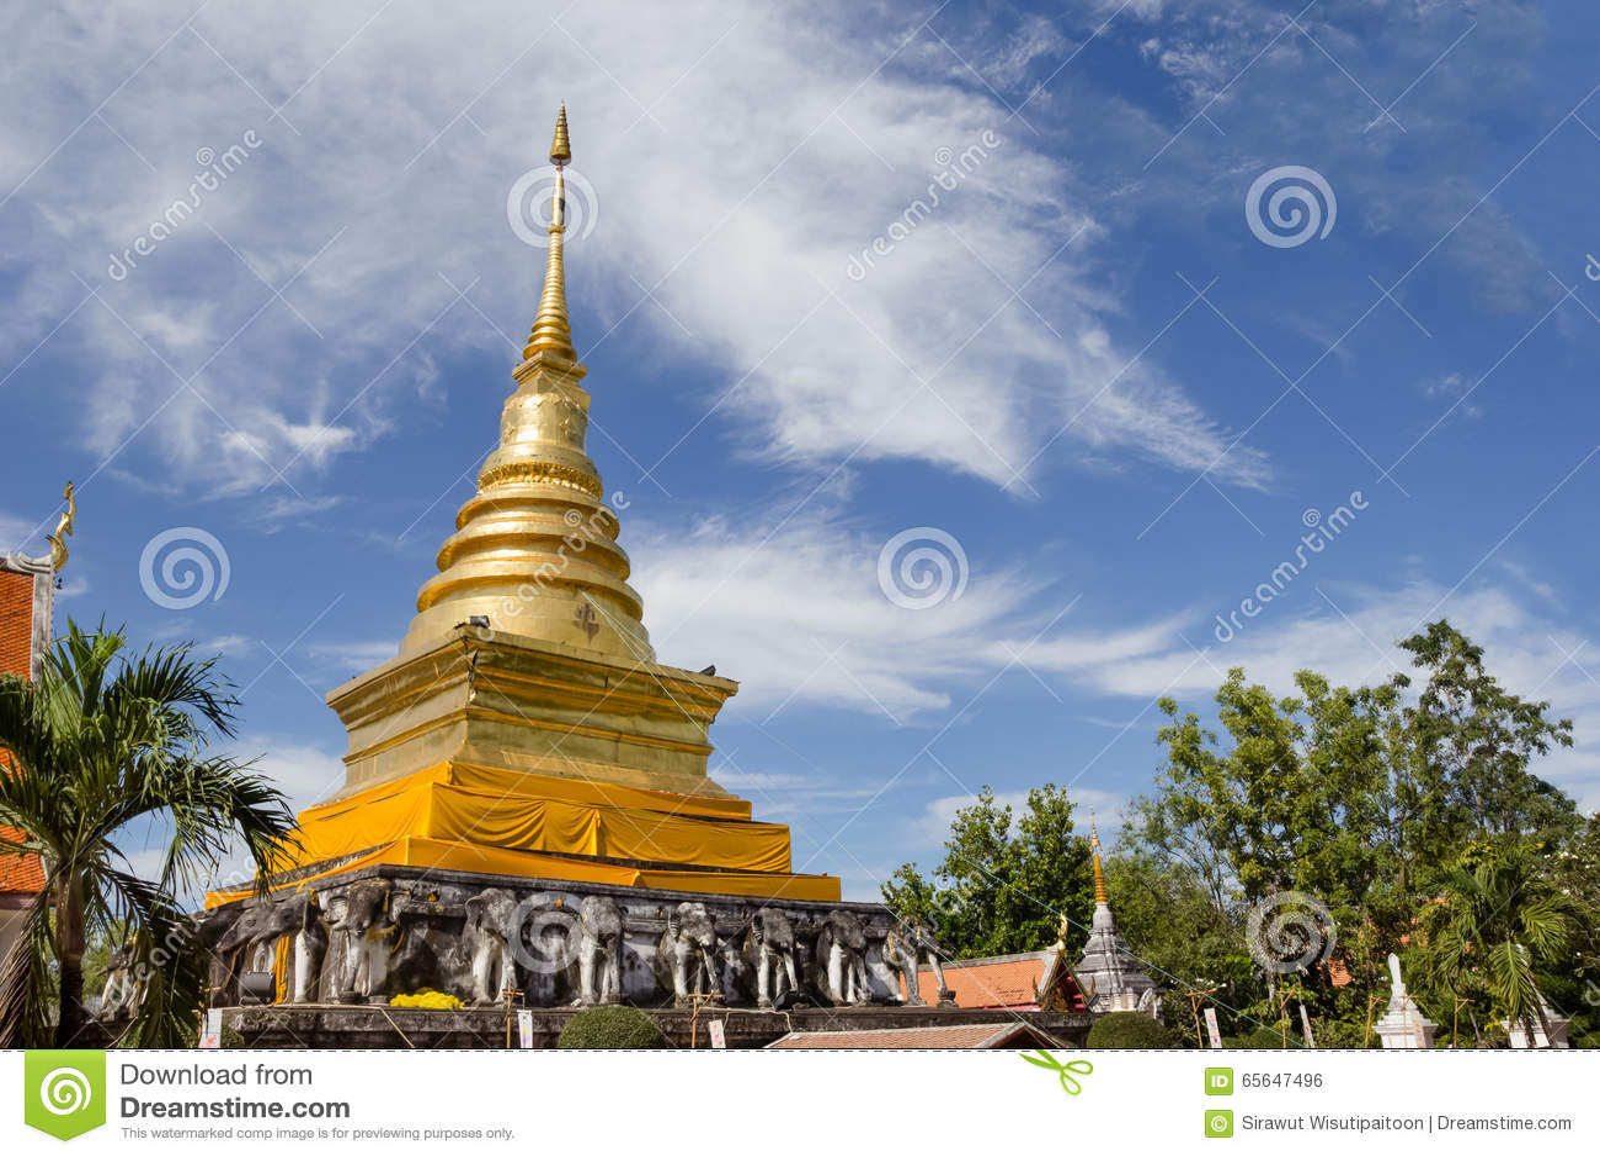 Temple de Wat Pra Tard Chang Kum en Nan Province, Thaïlande